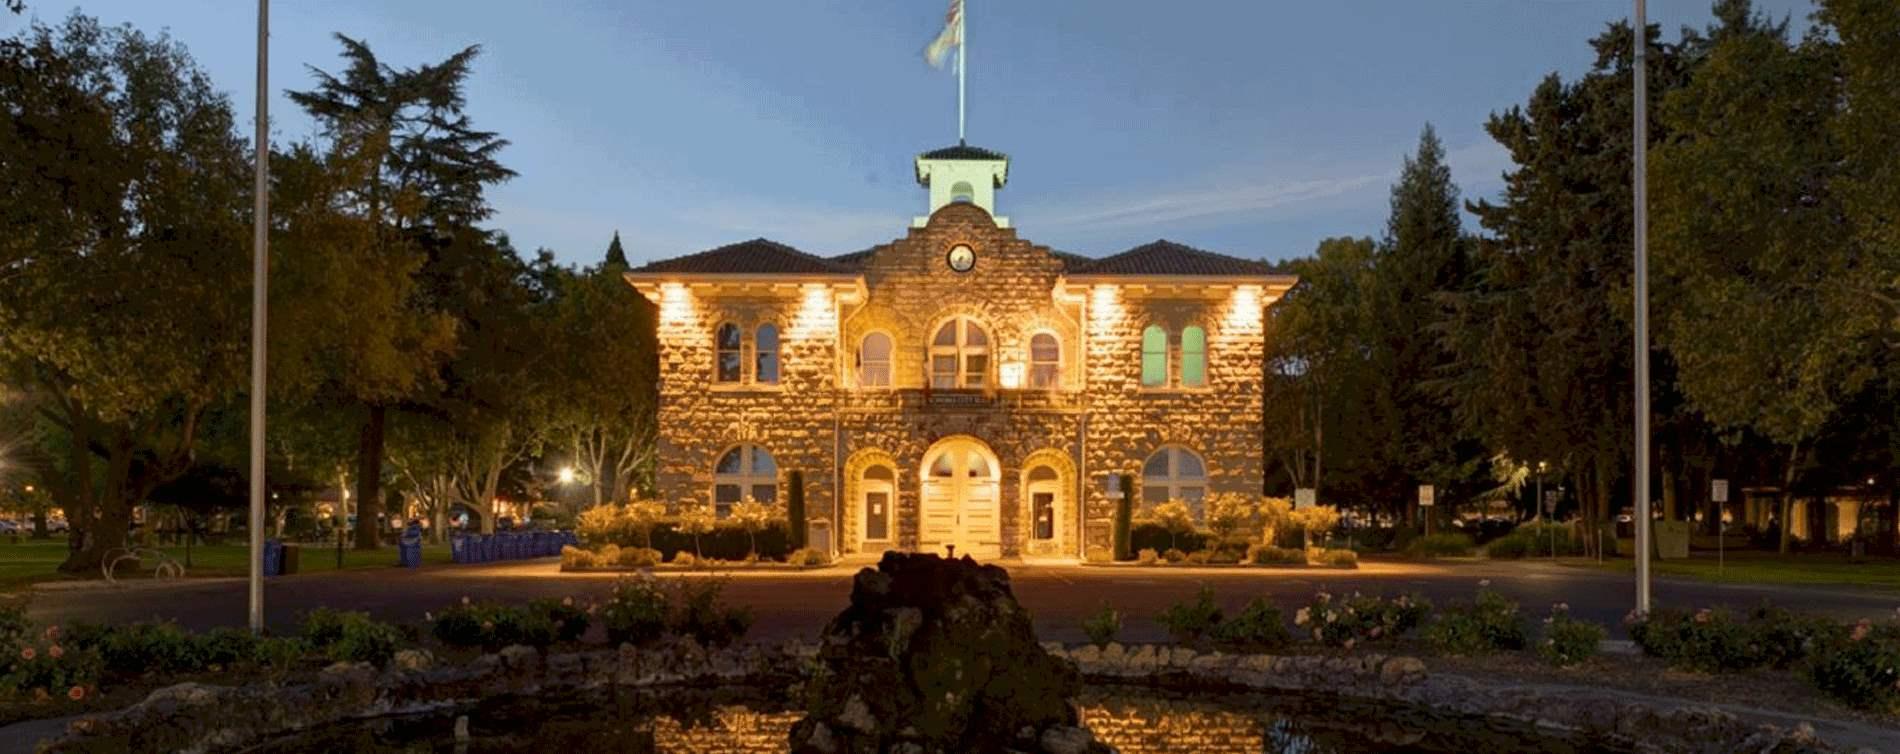 Location of BEST WESTERN Sonoma Valley Inn & Krug Event Center